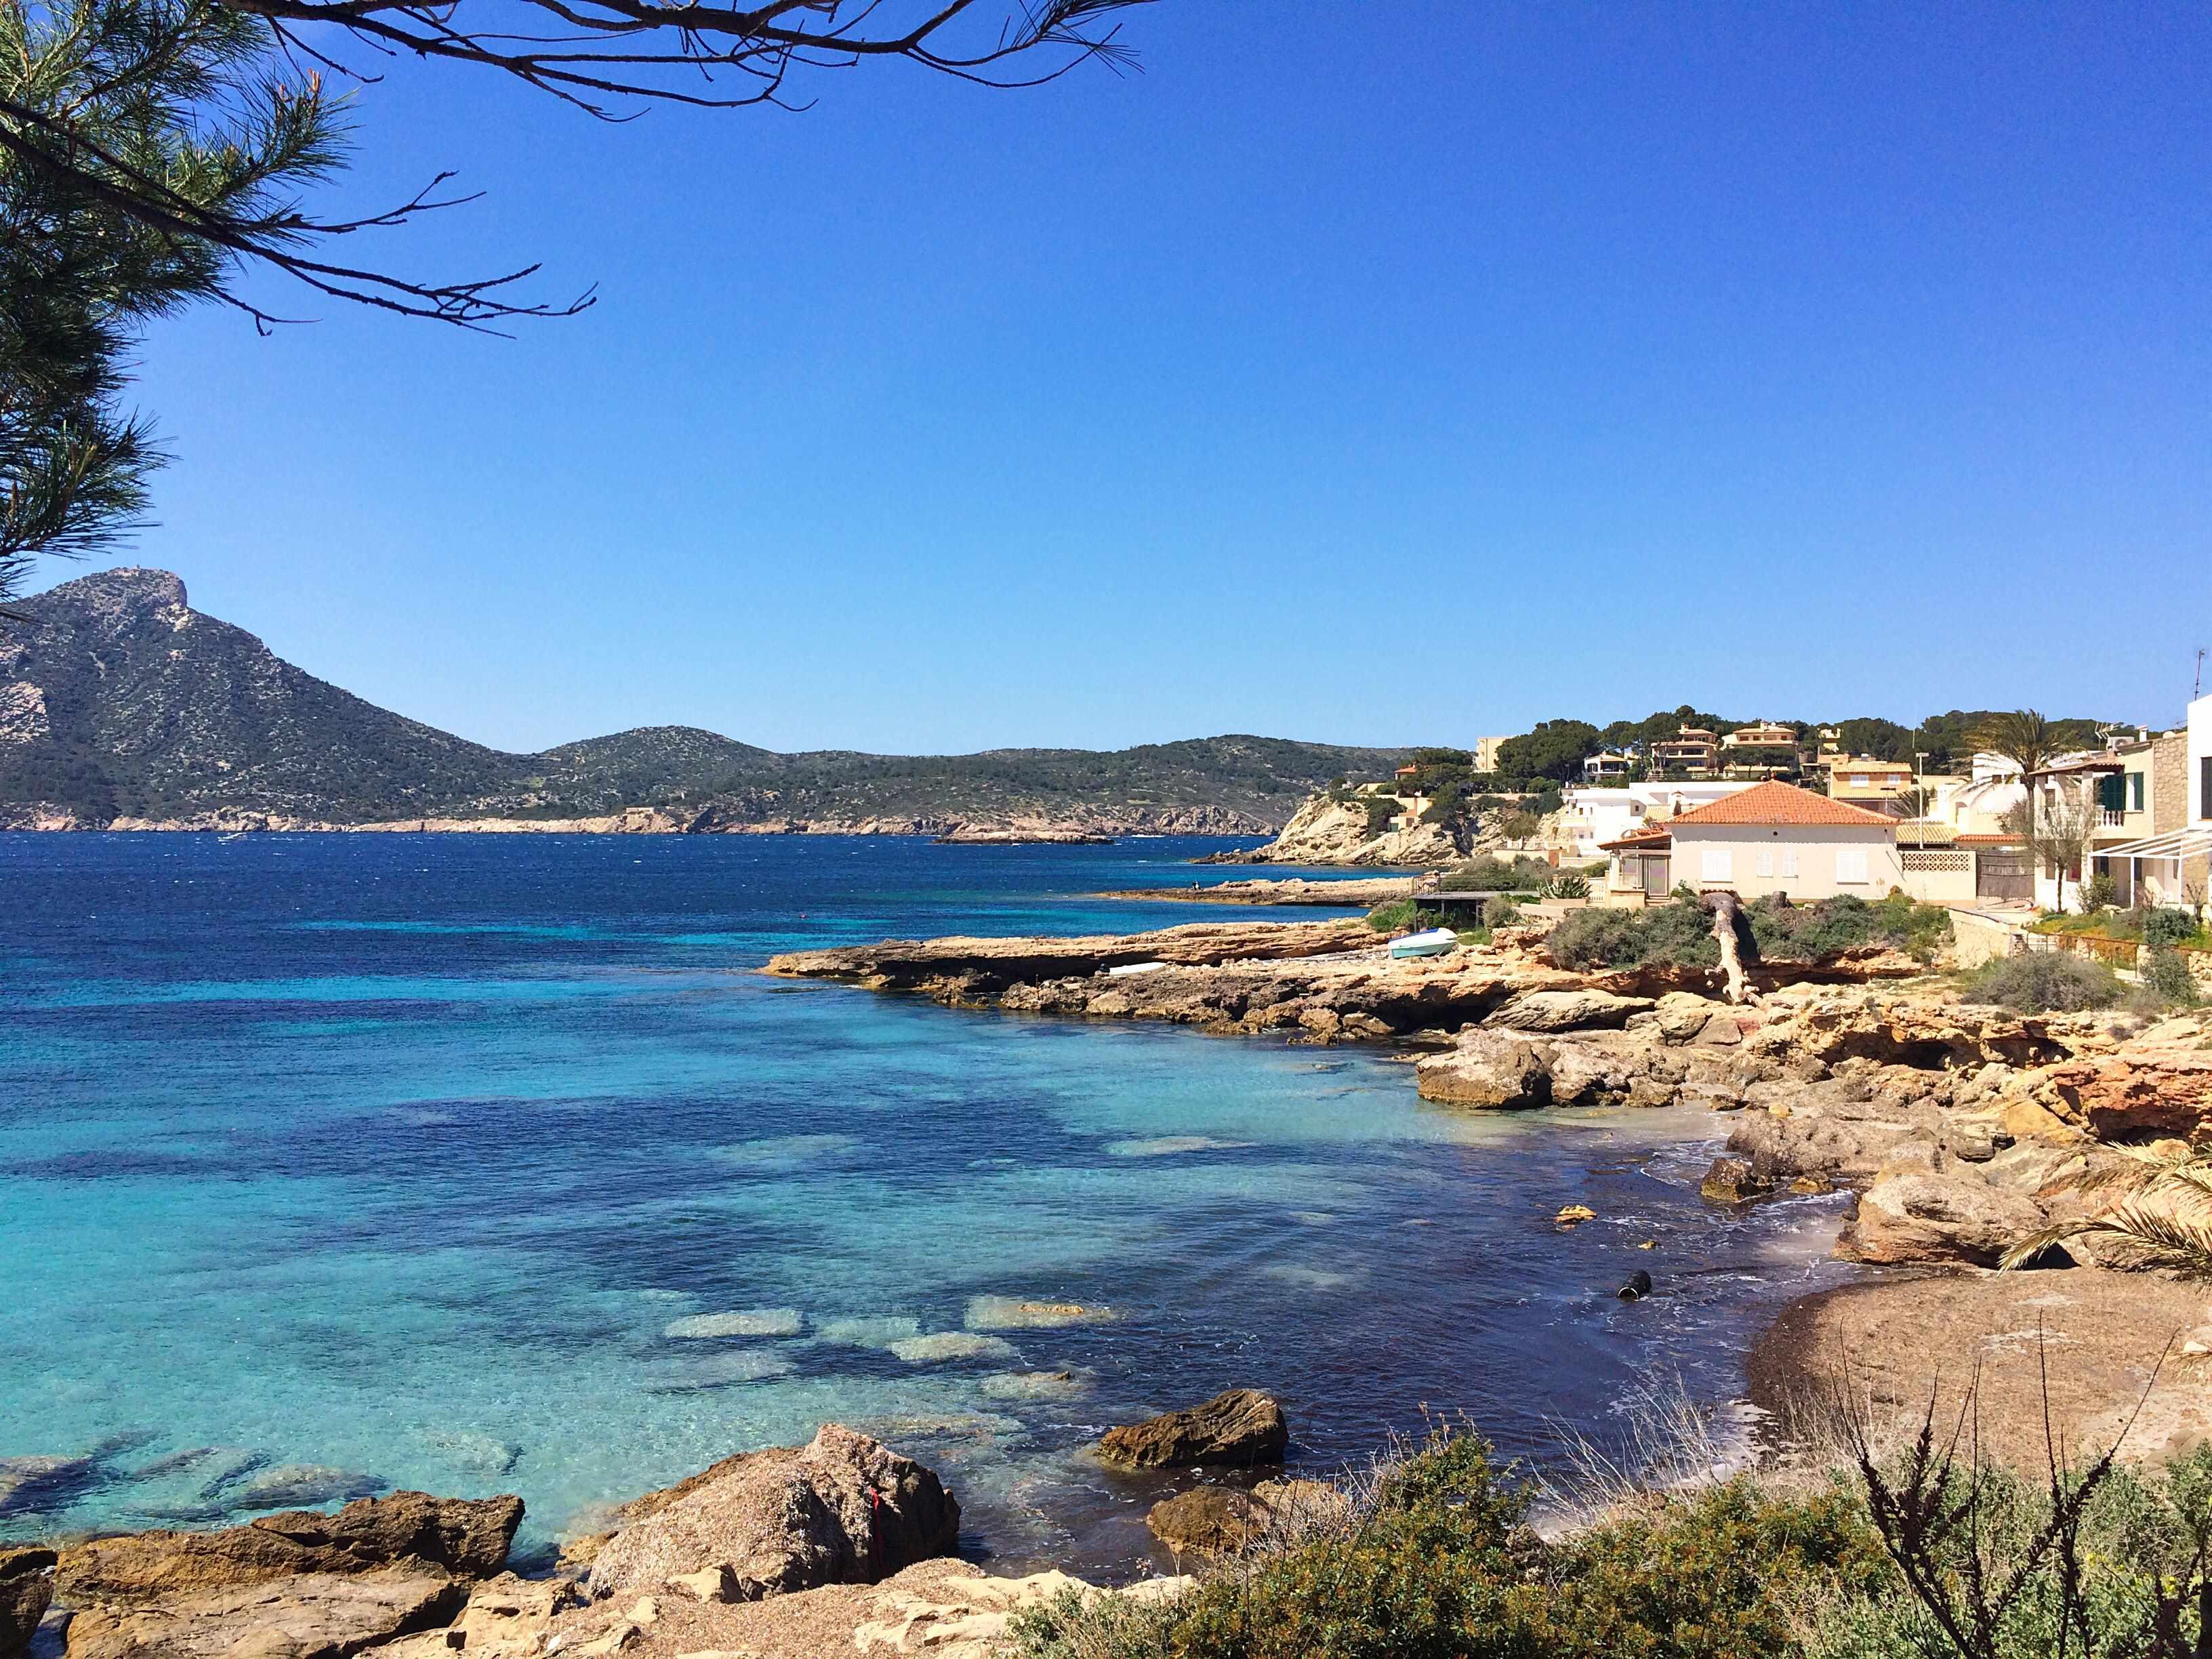 Mein perfektes Mallorca Wochenende staedtereisen sonne land und leute mallorca familie europa  tui berlin mallorca kueste sant elmo